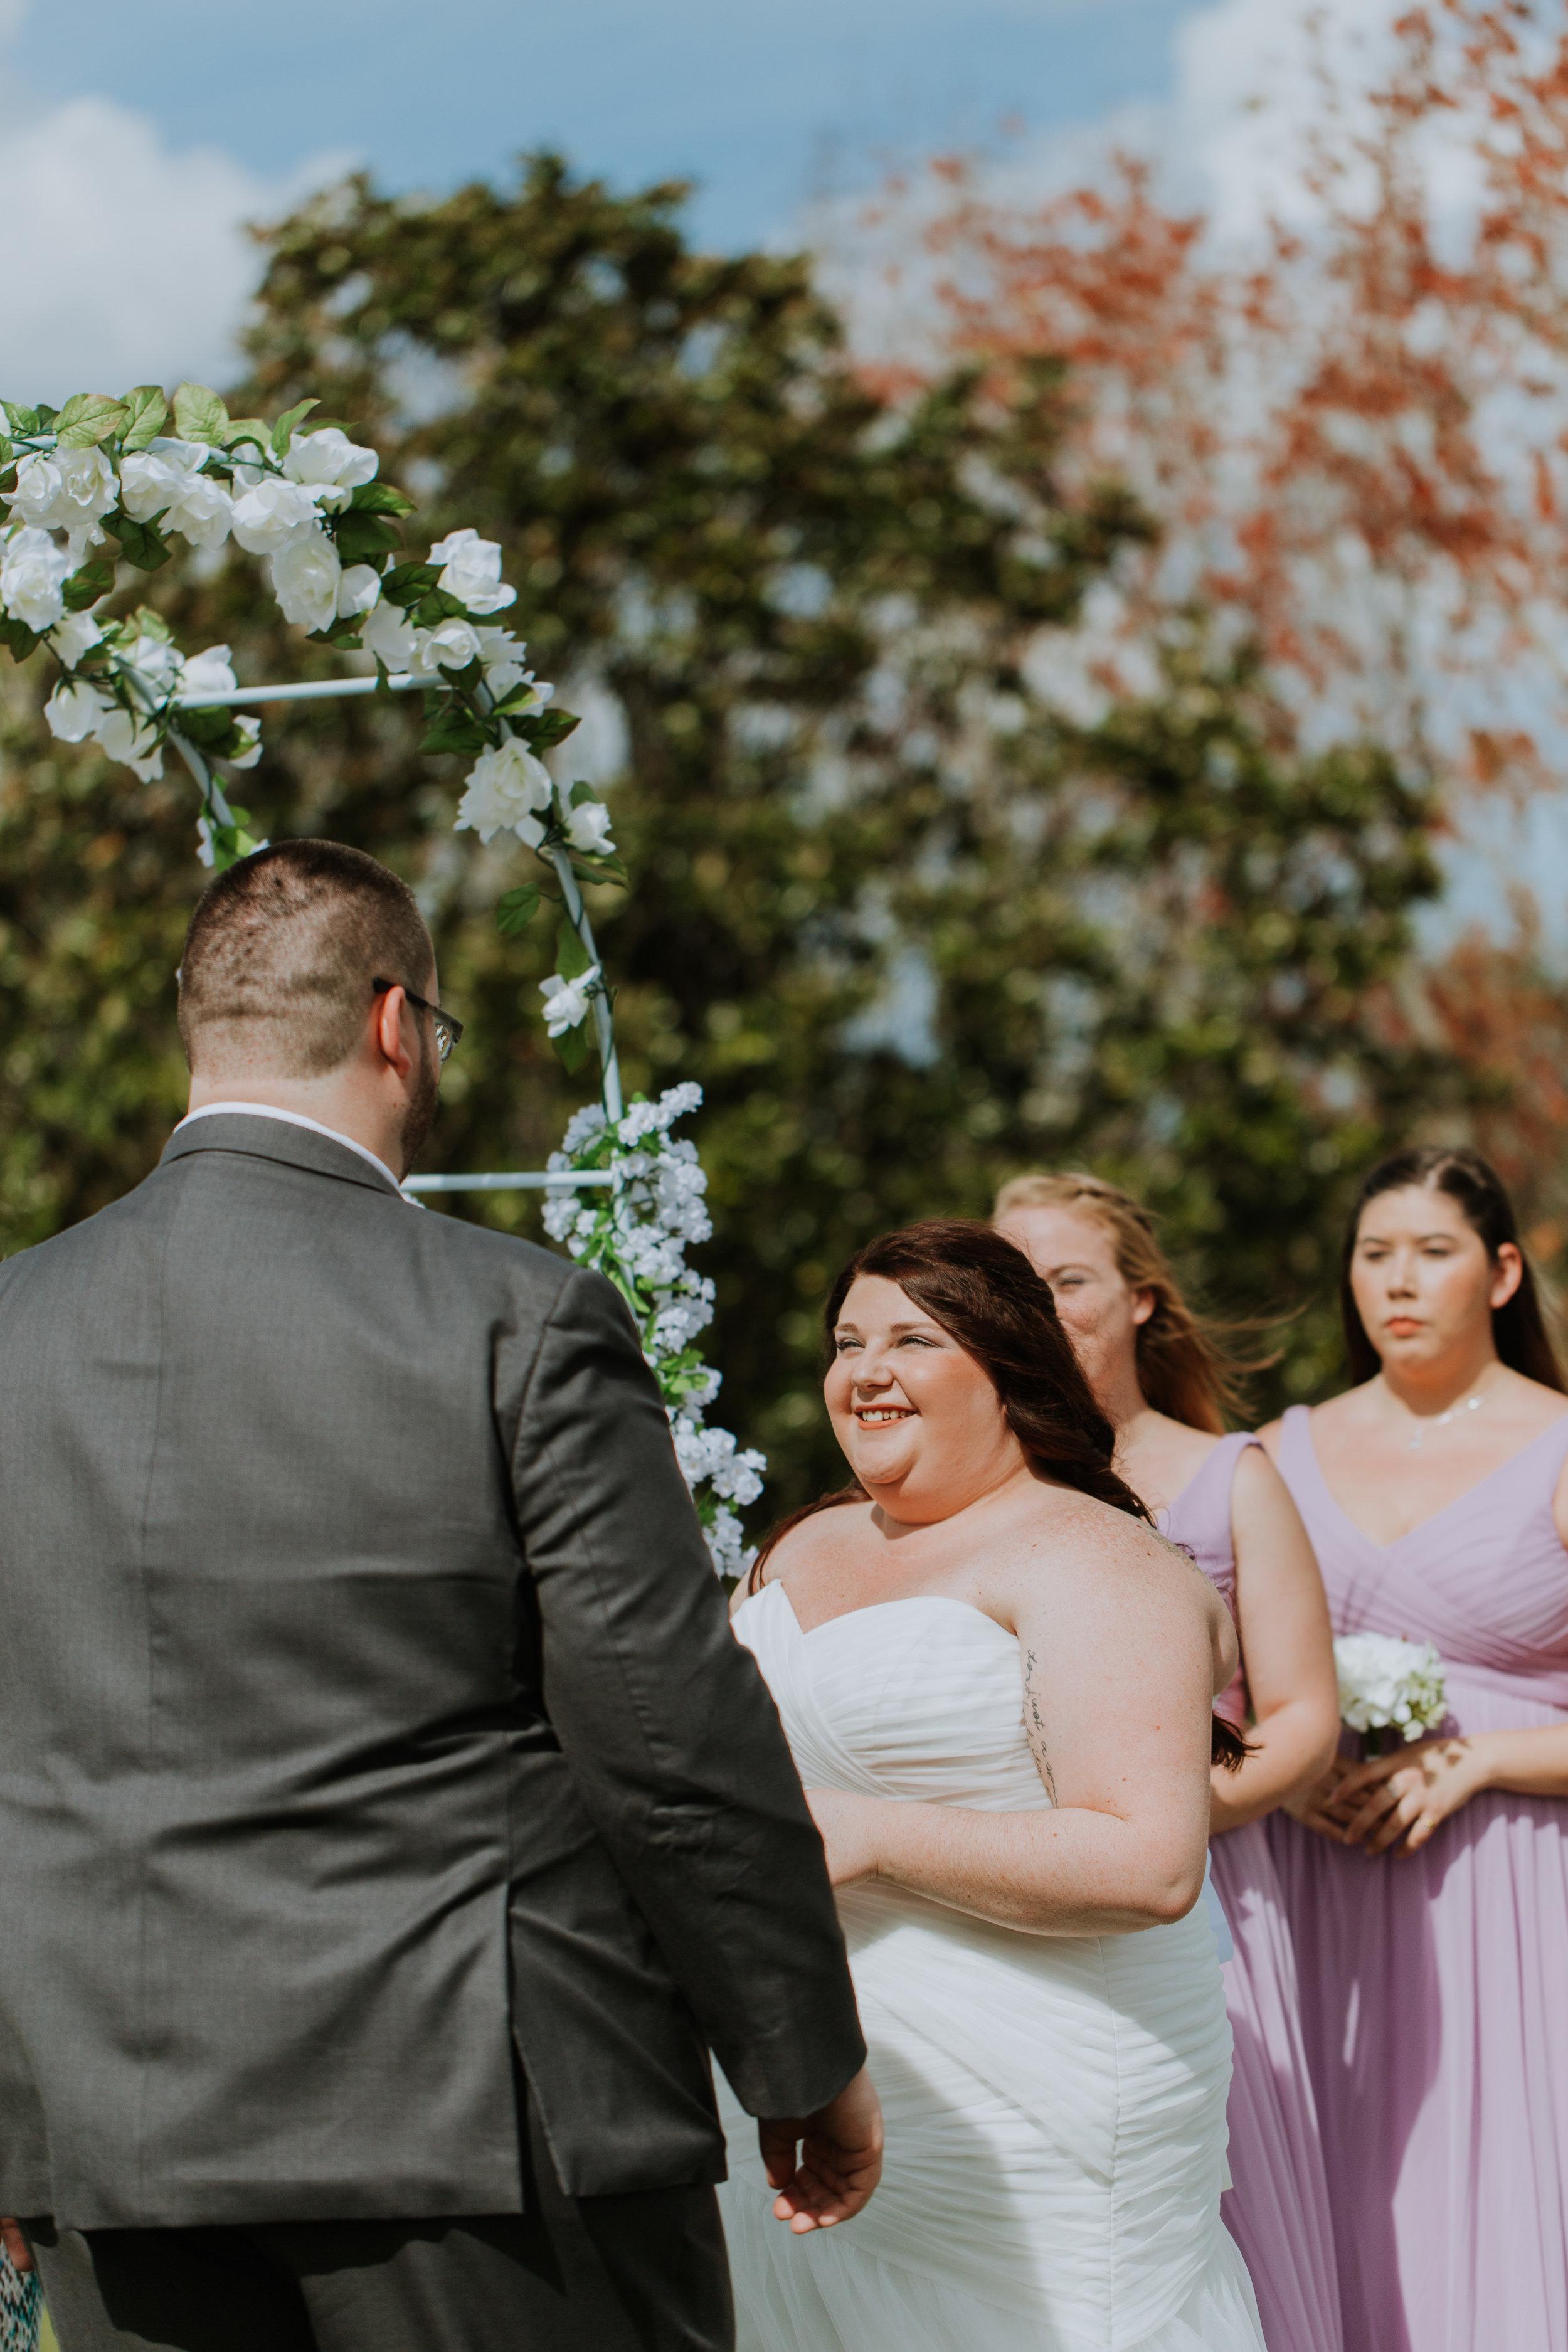 appolloni_new smyrna_wedding-211.jpg